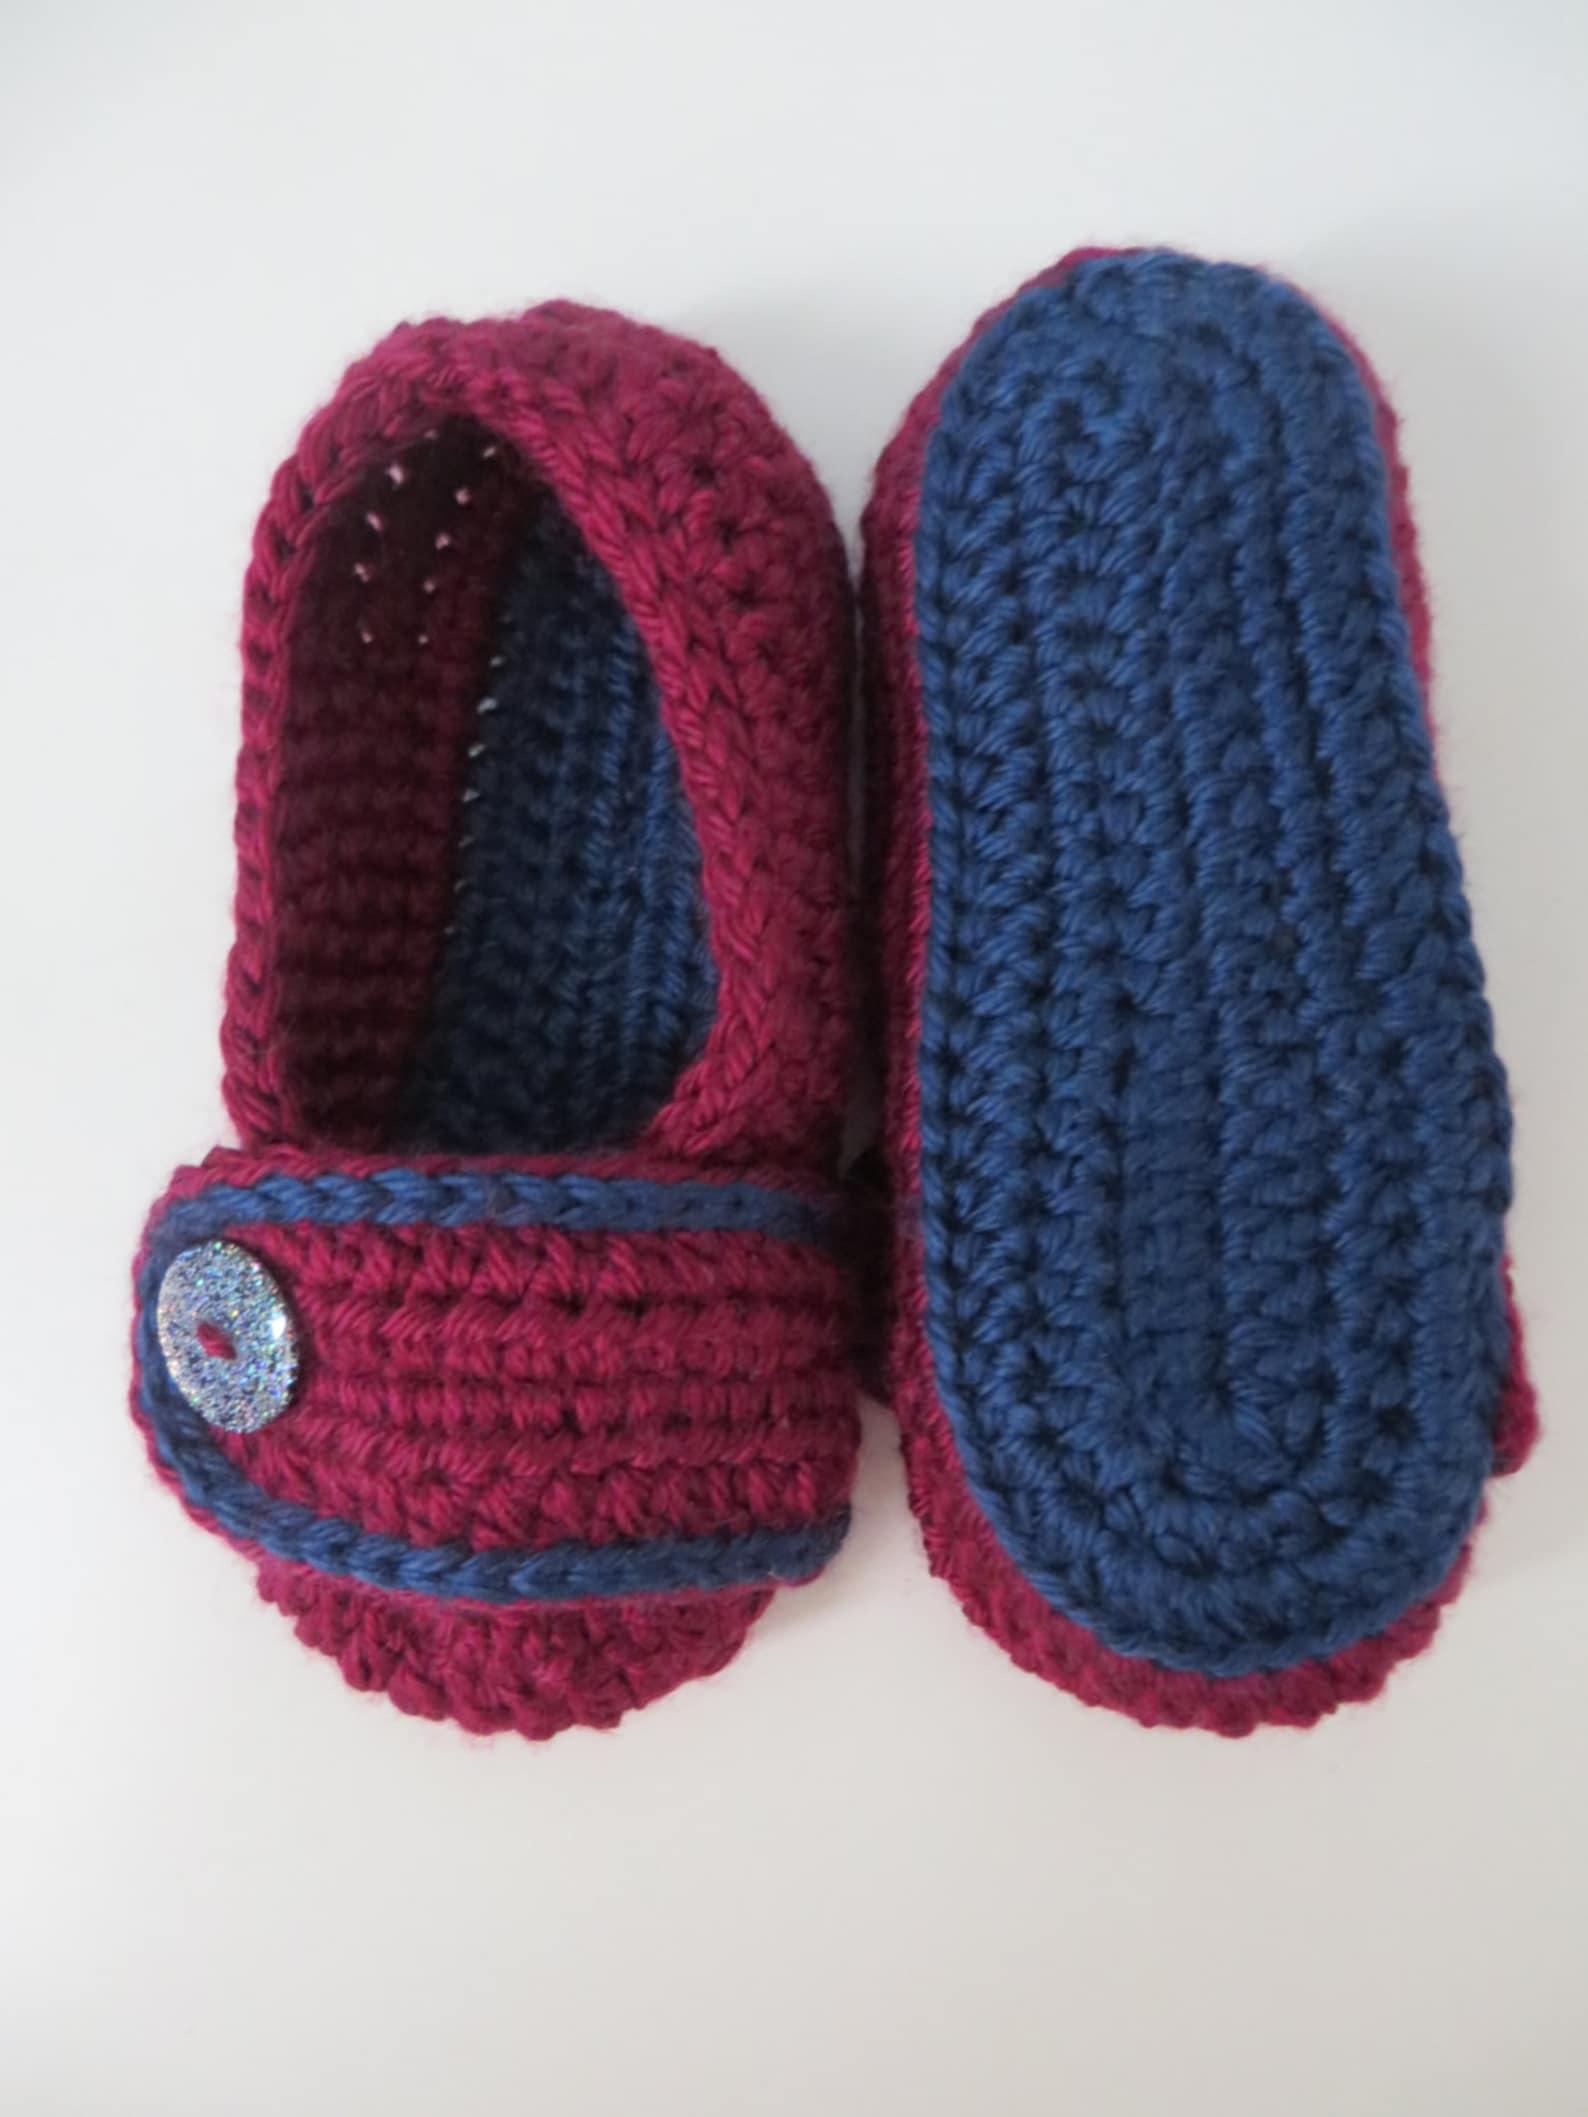 girls crocheted slip on slippers burgundy/navy colours 5.5 inch/14 cm sole ballet style soft slippers 2 years - 3 years preschoo